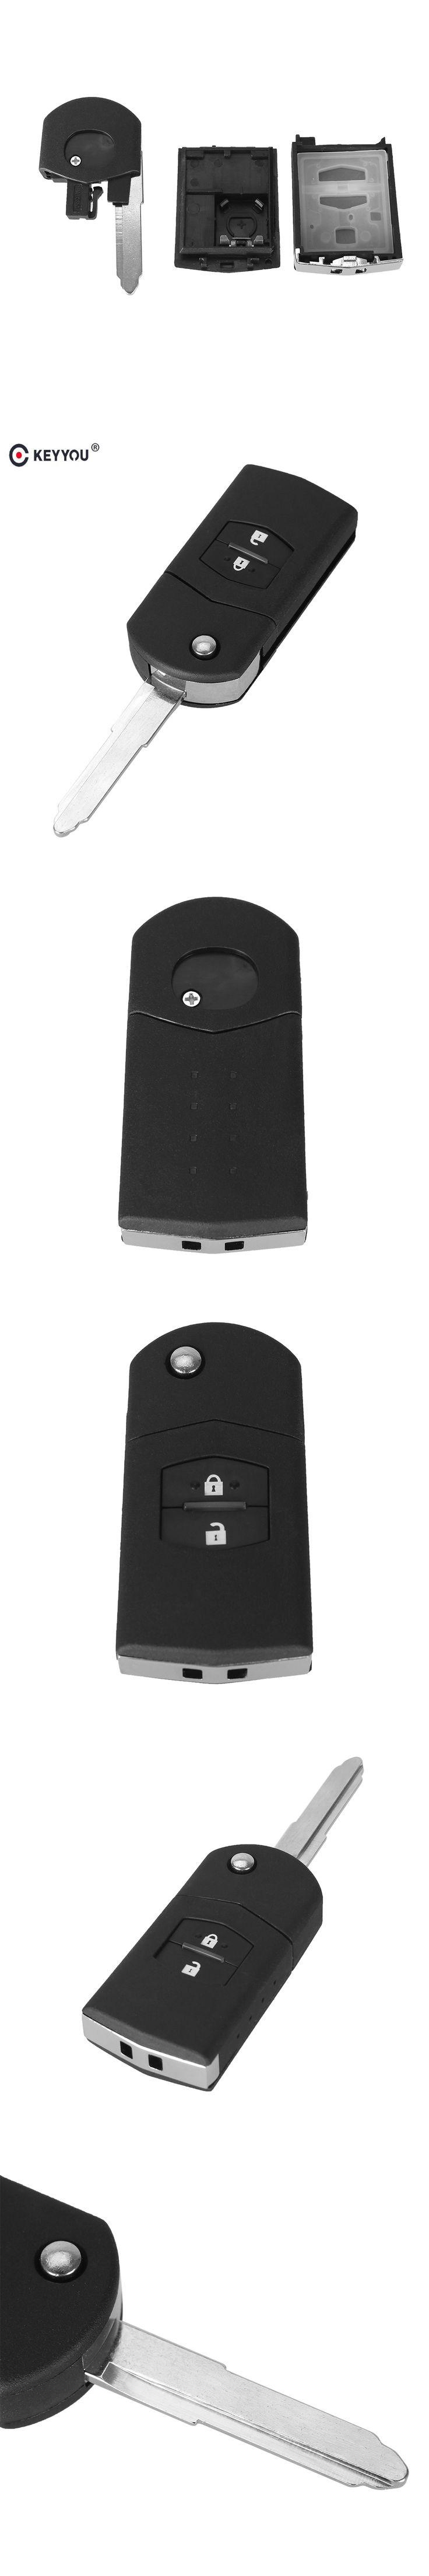 KEYYOU 2 button remote key blank case Folding Flip Remote Key Shell Case Fob PAD FOR MAZDA 2 3 5 6 RX8 MX5 2B Free shipping